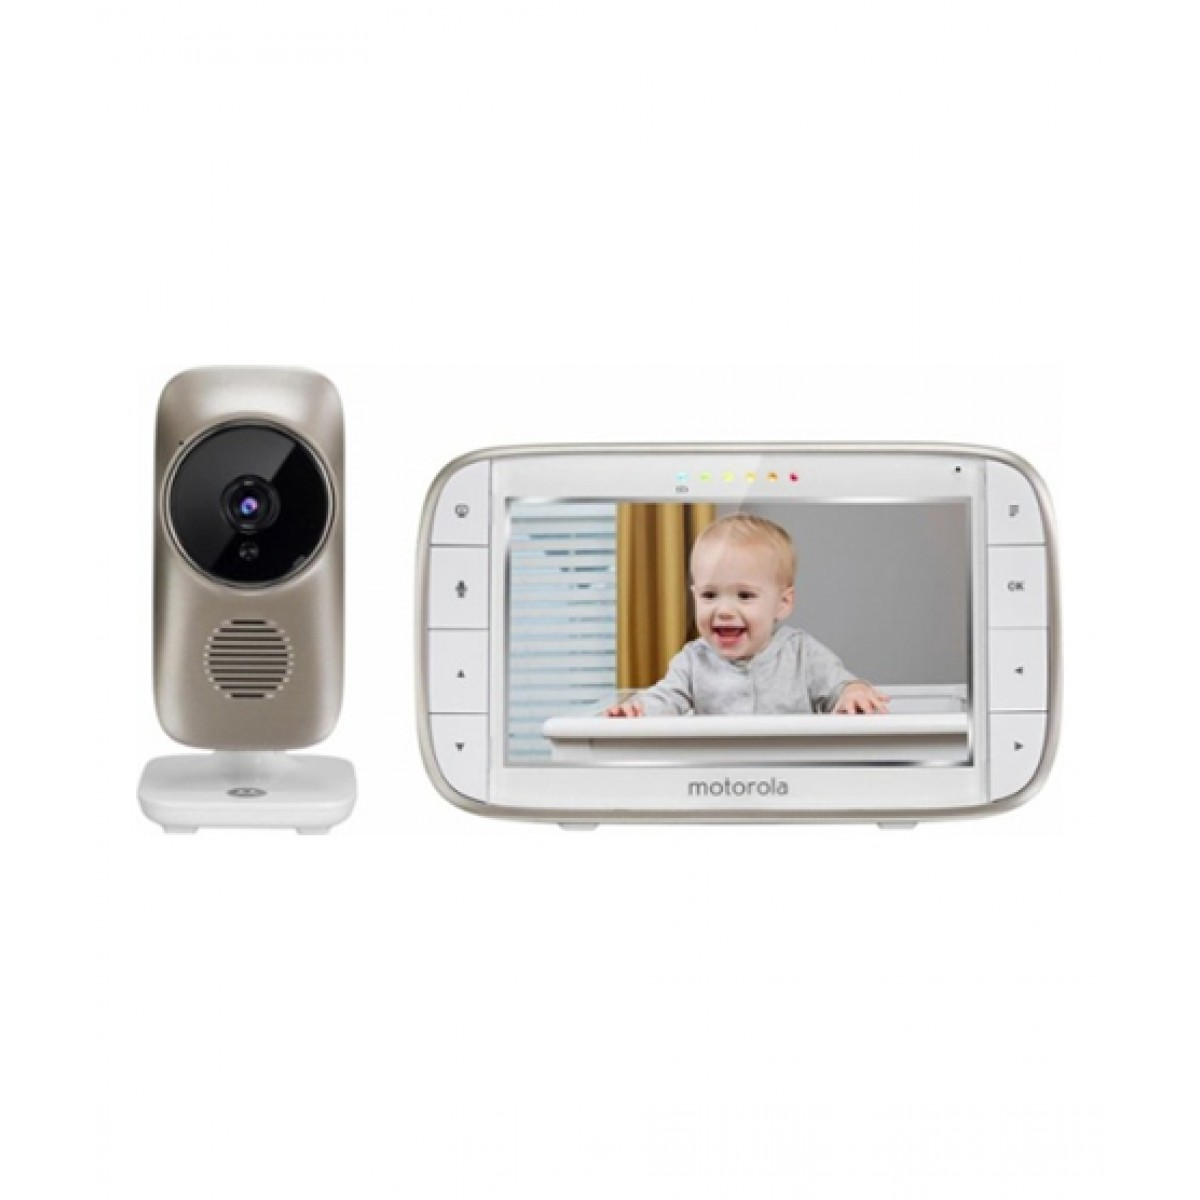 Motorola Baby Video Monitor White (MBP845CONNECT)